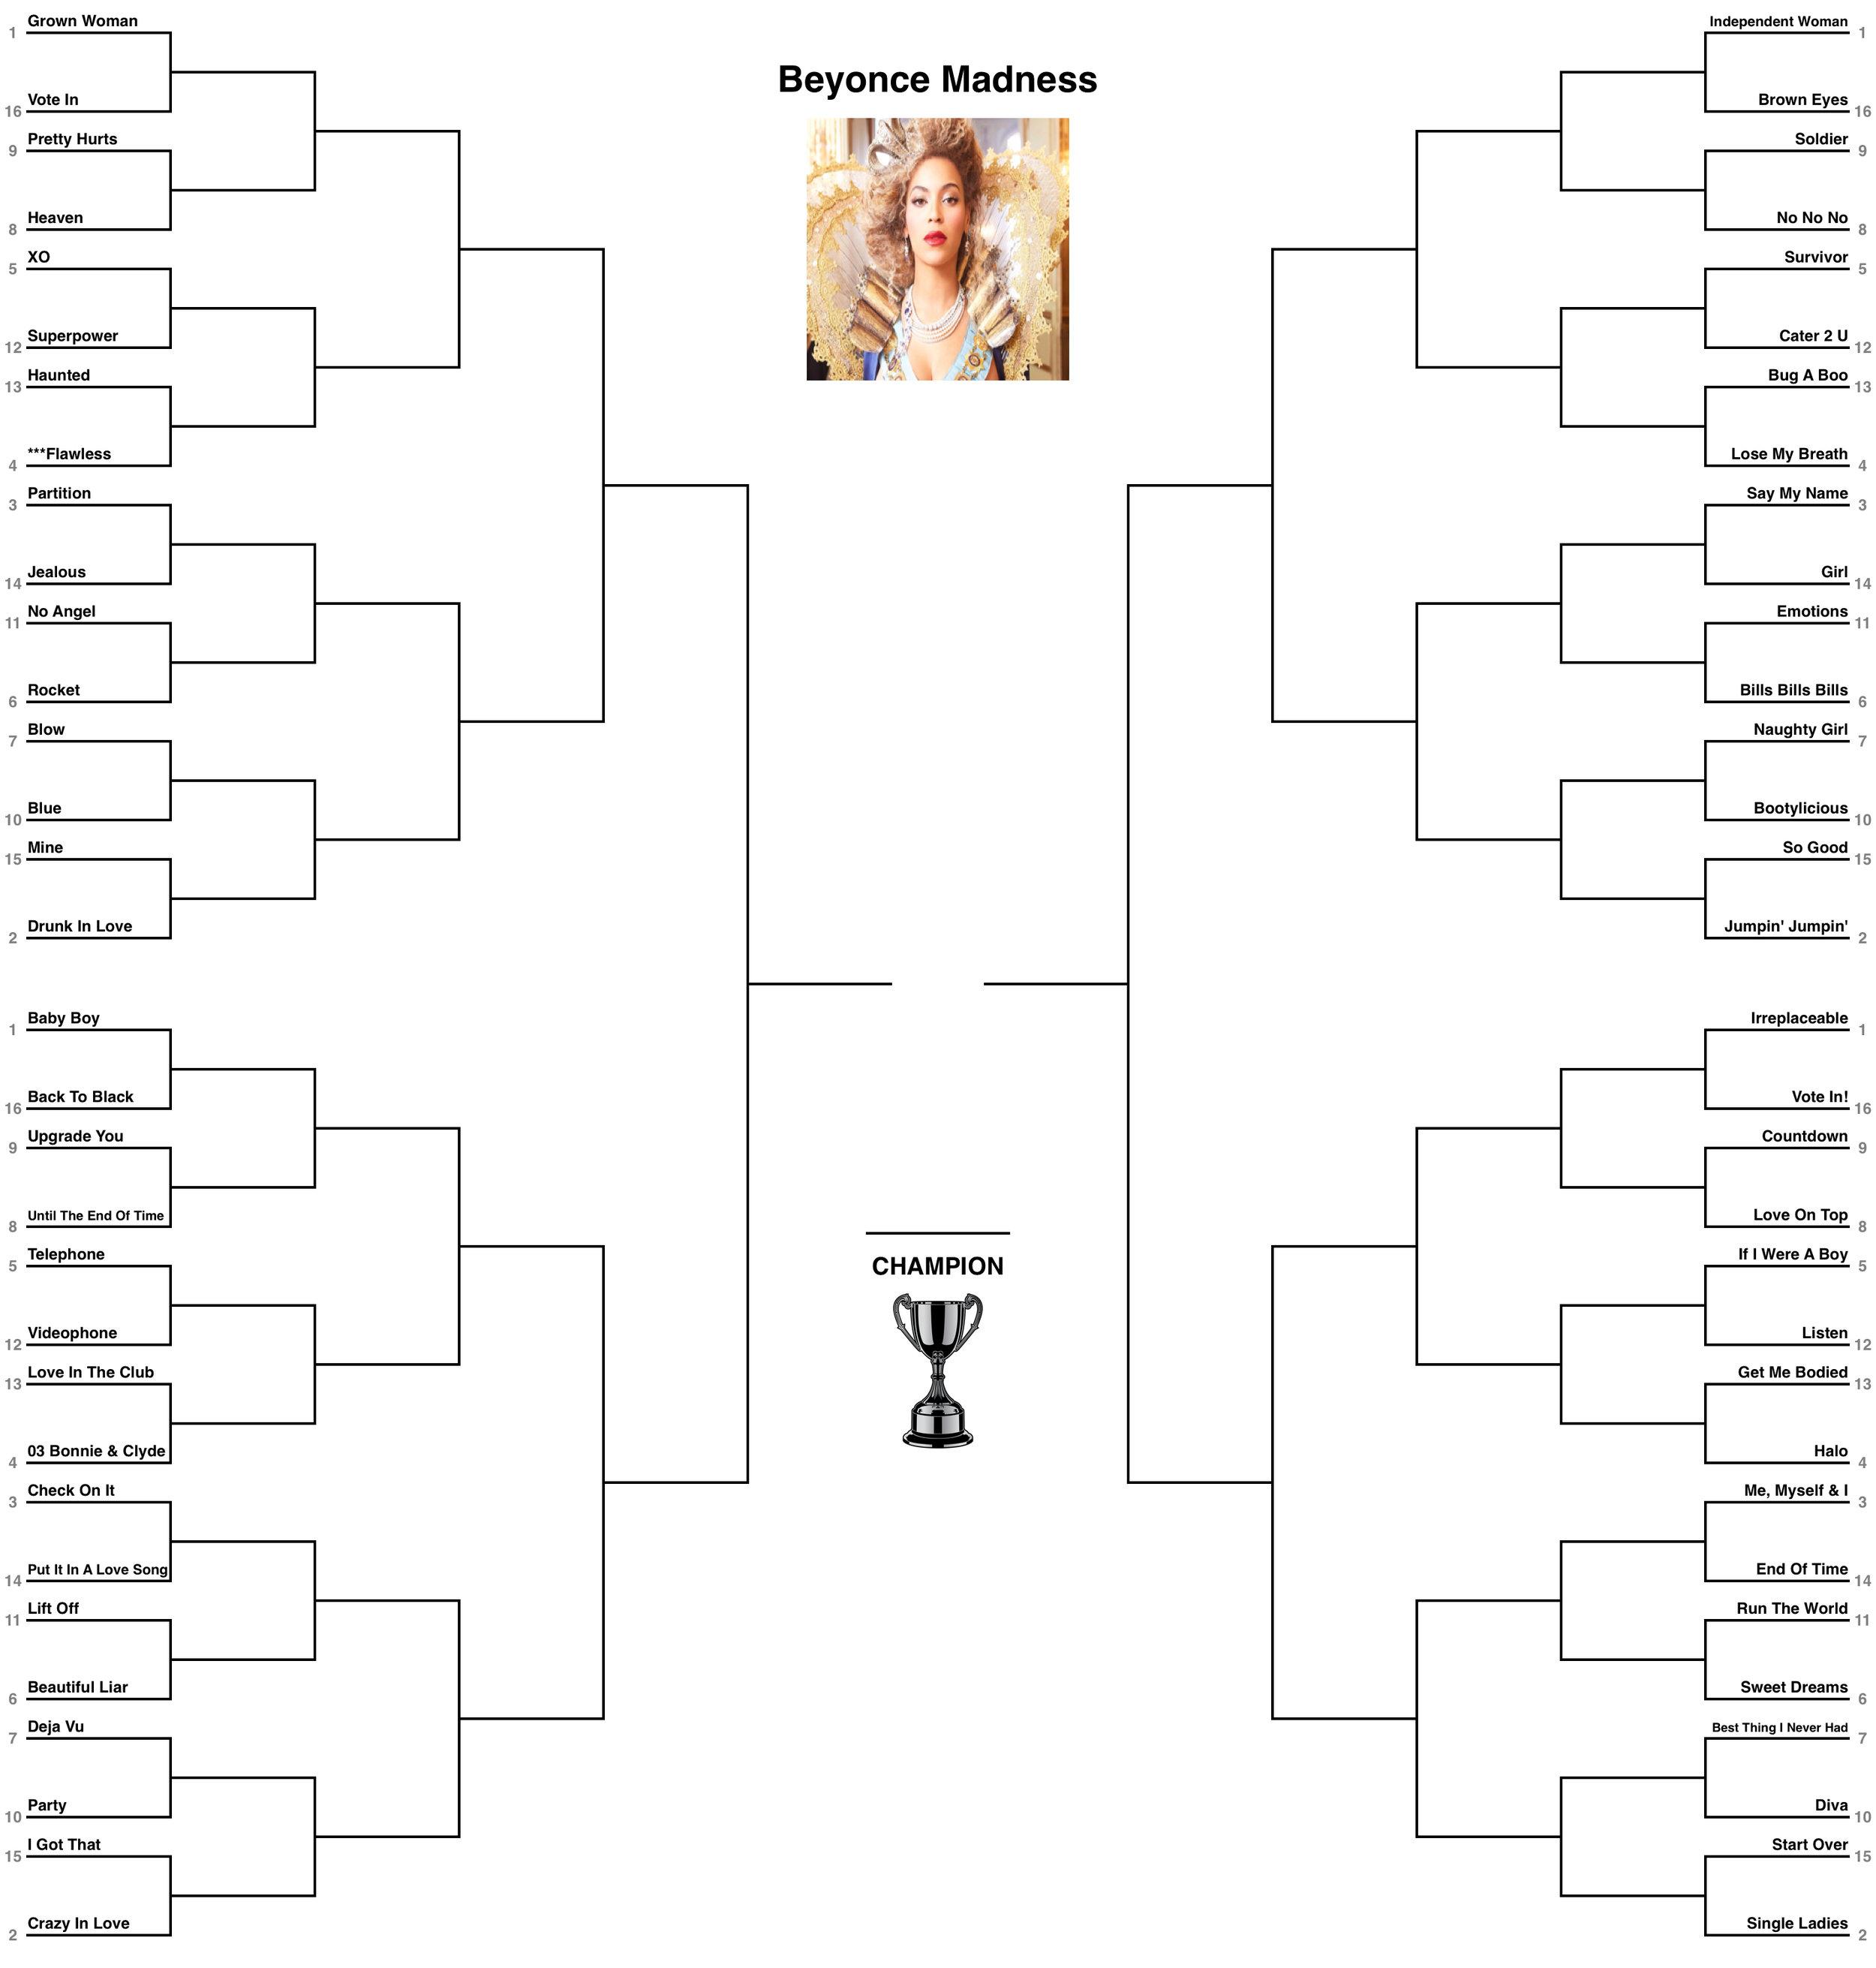 Beyoncé Madness